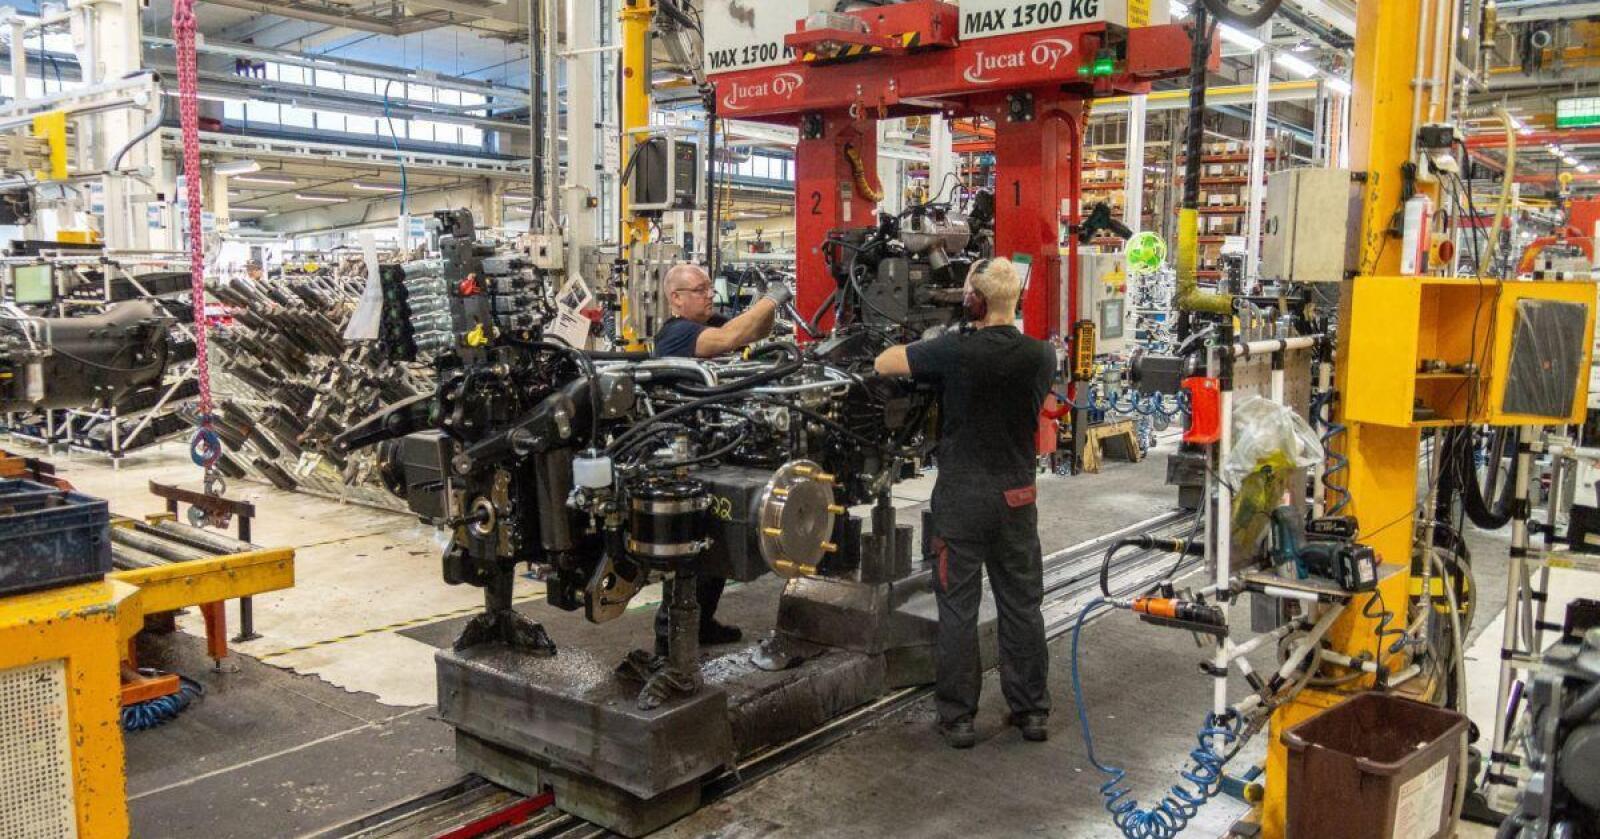 Komponentmangel: CNH må stenge flere fabrikker en periode i oktober, grunnet komponentmangel. Arkivbilde: CNH